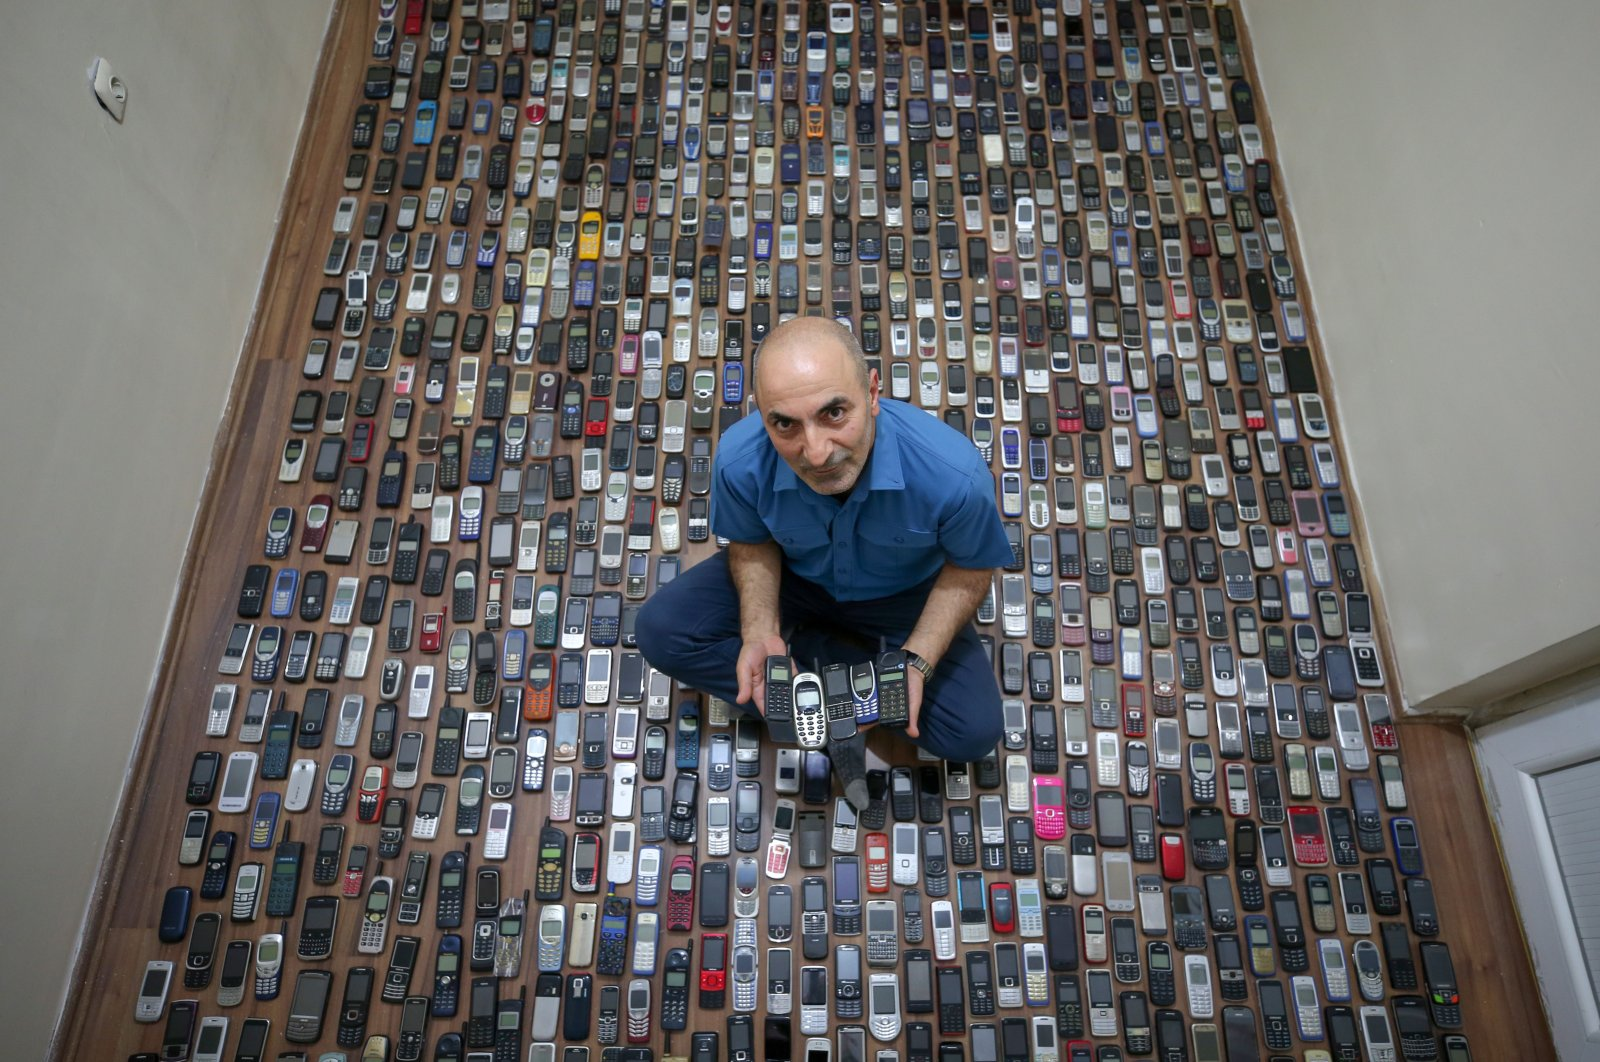 Şahabettin Özçelik poses with his phone collection, in Van, eastern Turkey, Nov. 5, 2020. (AA Photo)